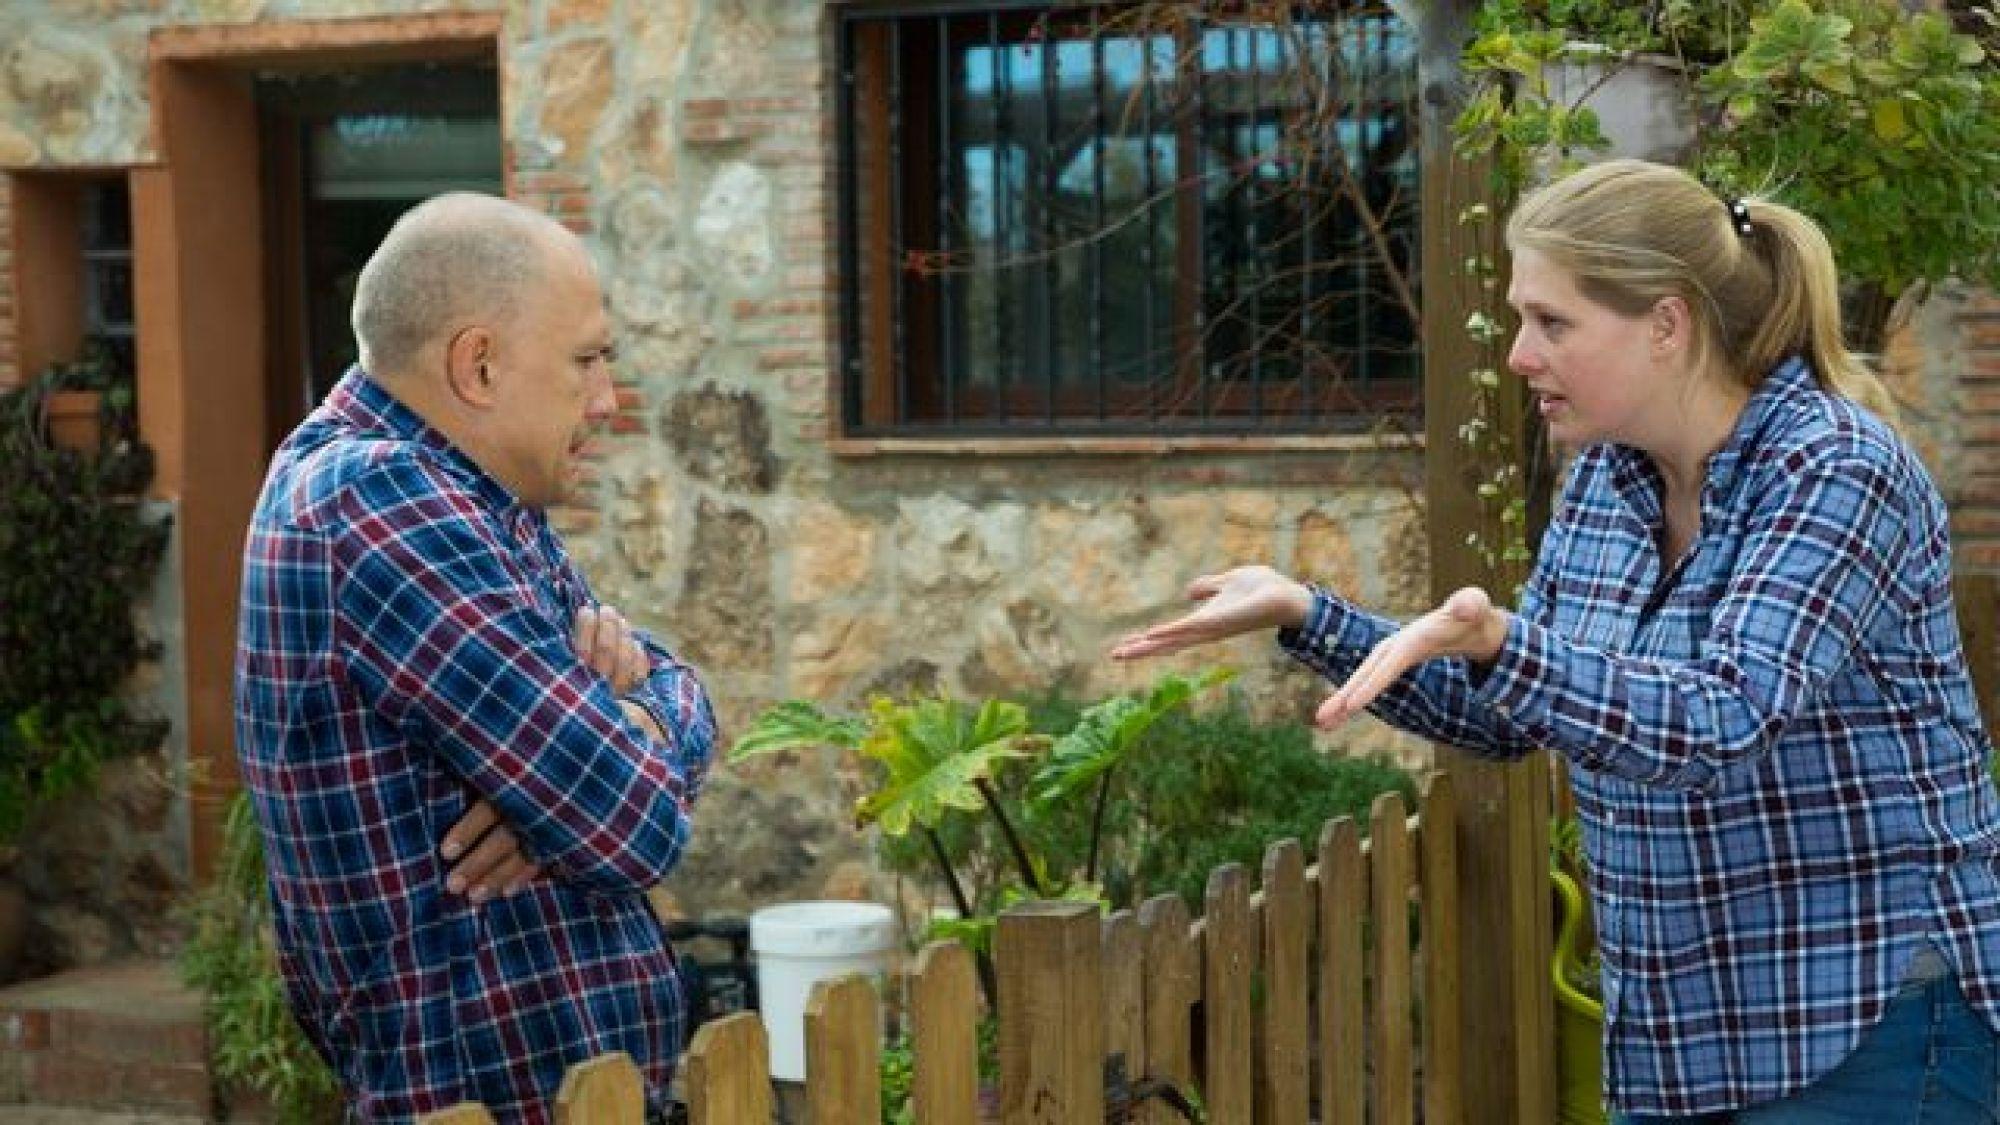 HOA can mediate disputes between neighbors